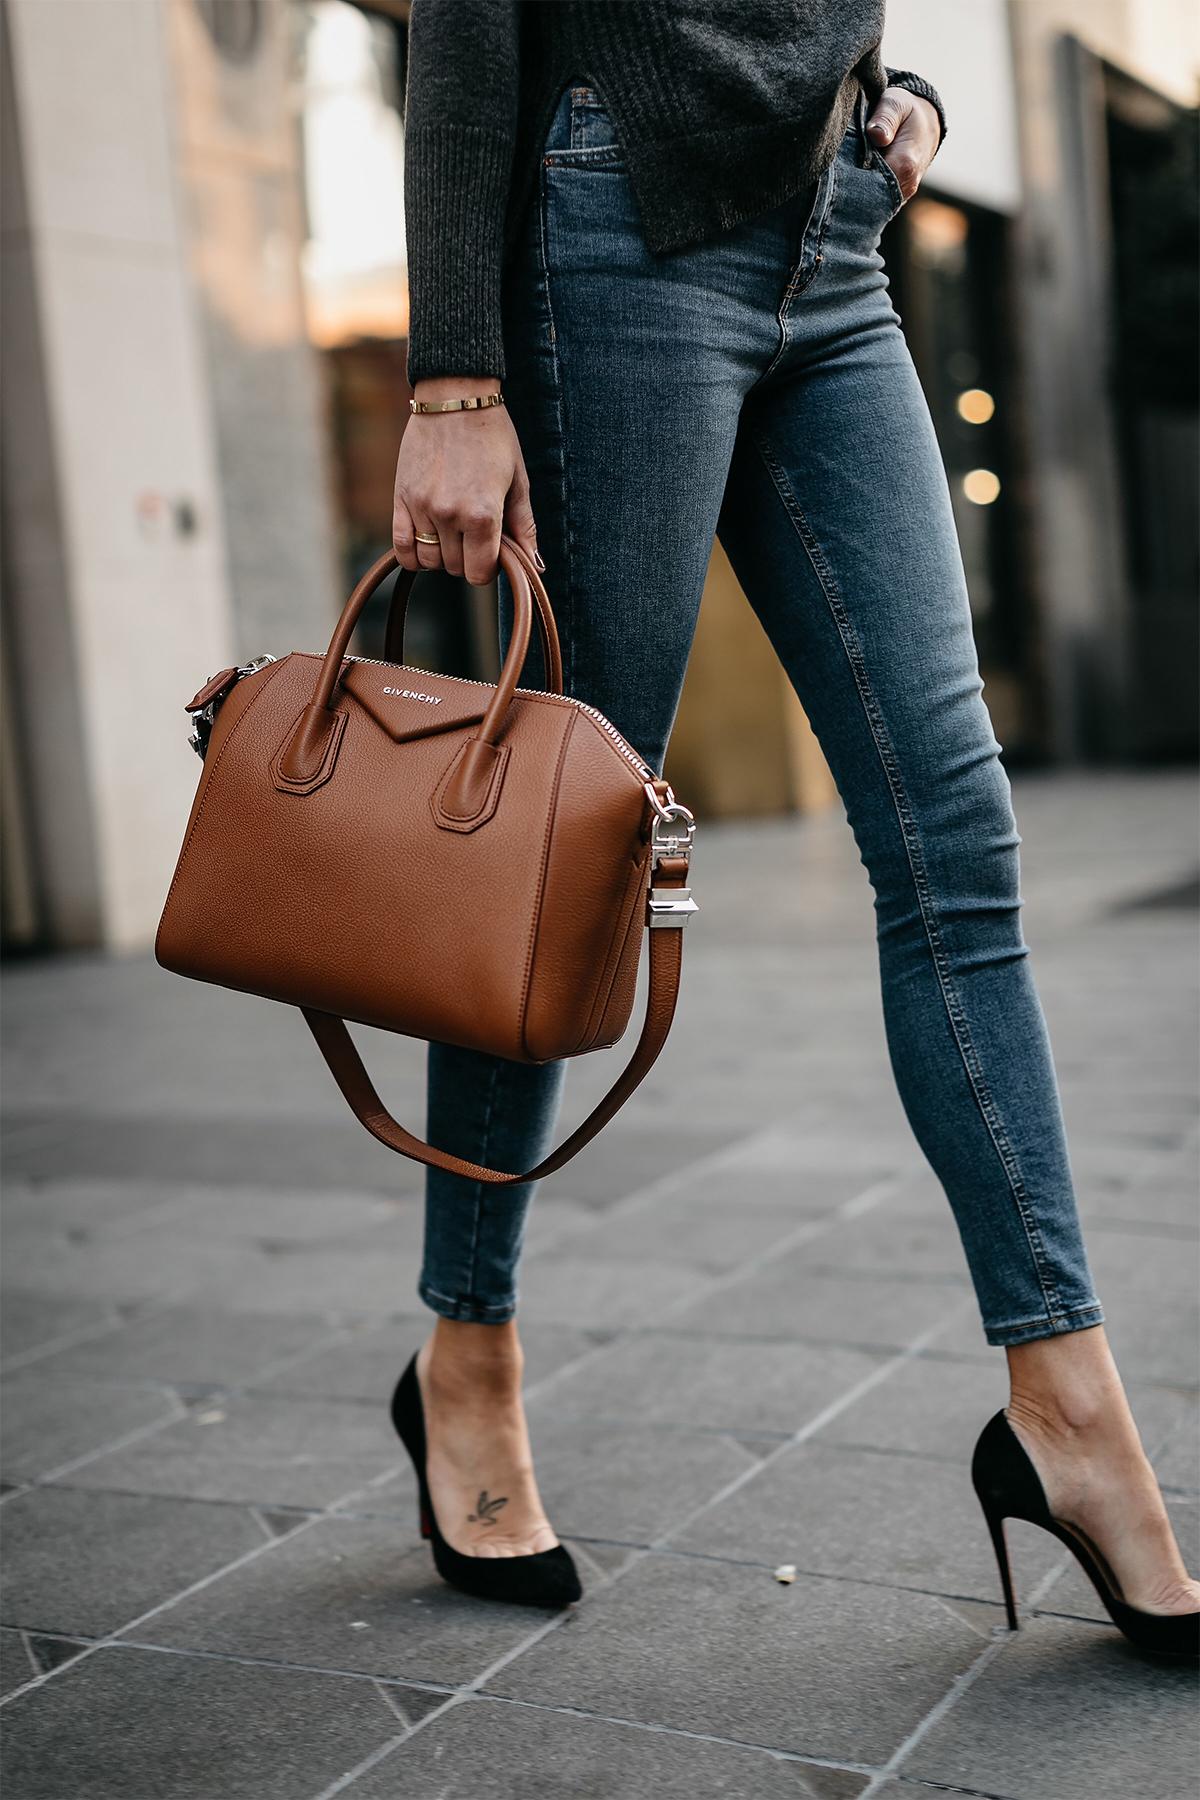 Denim Skinny Jeans Givenchy Antigona Cognac Handbag Black Pumps Fashion Jackson Dallas Blogger Fashion Blogger Street Style